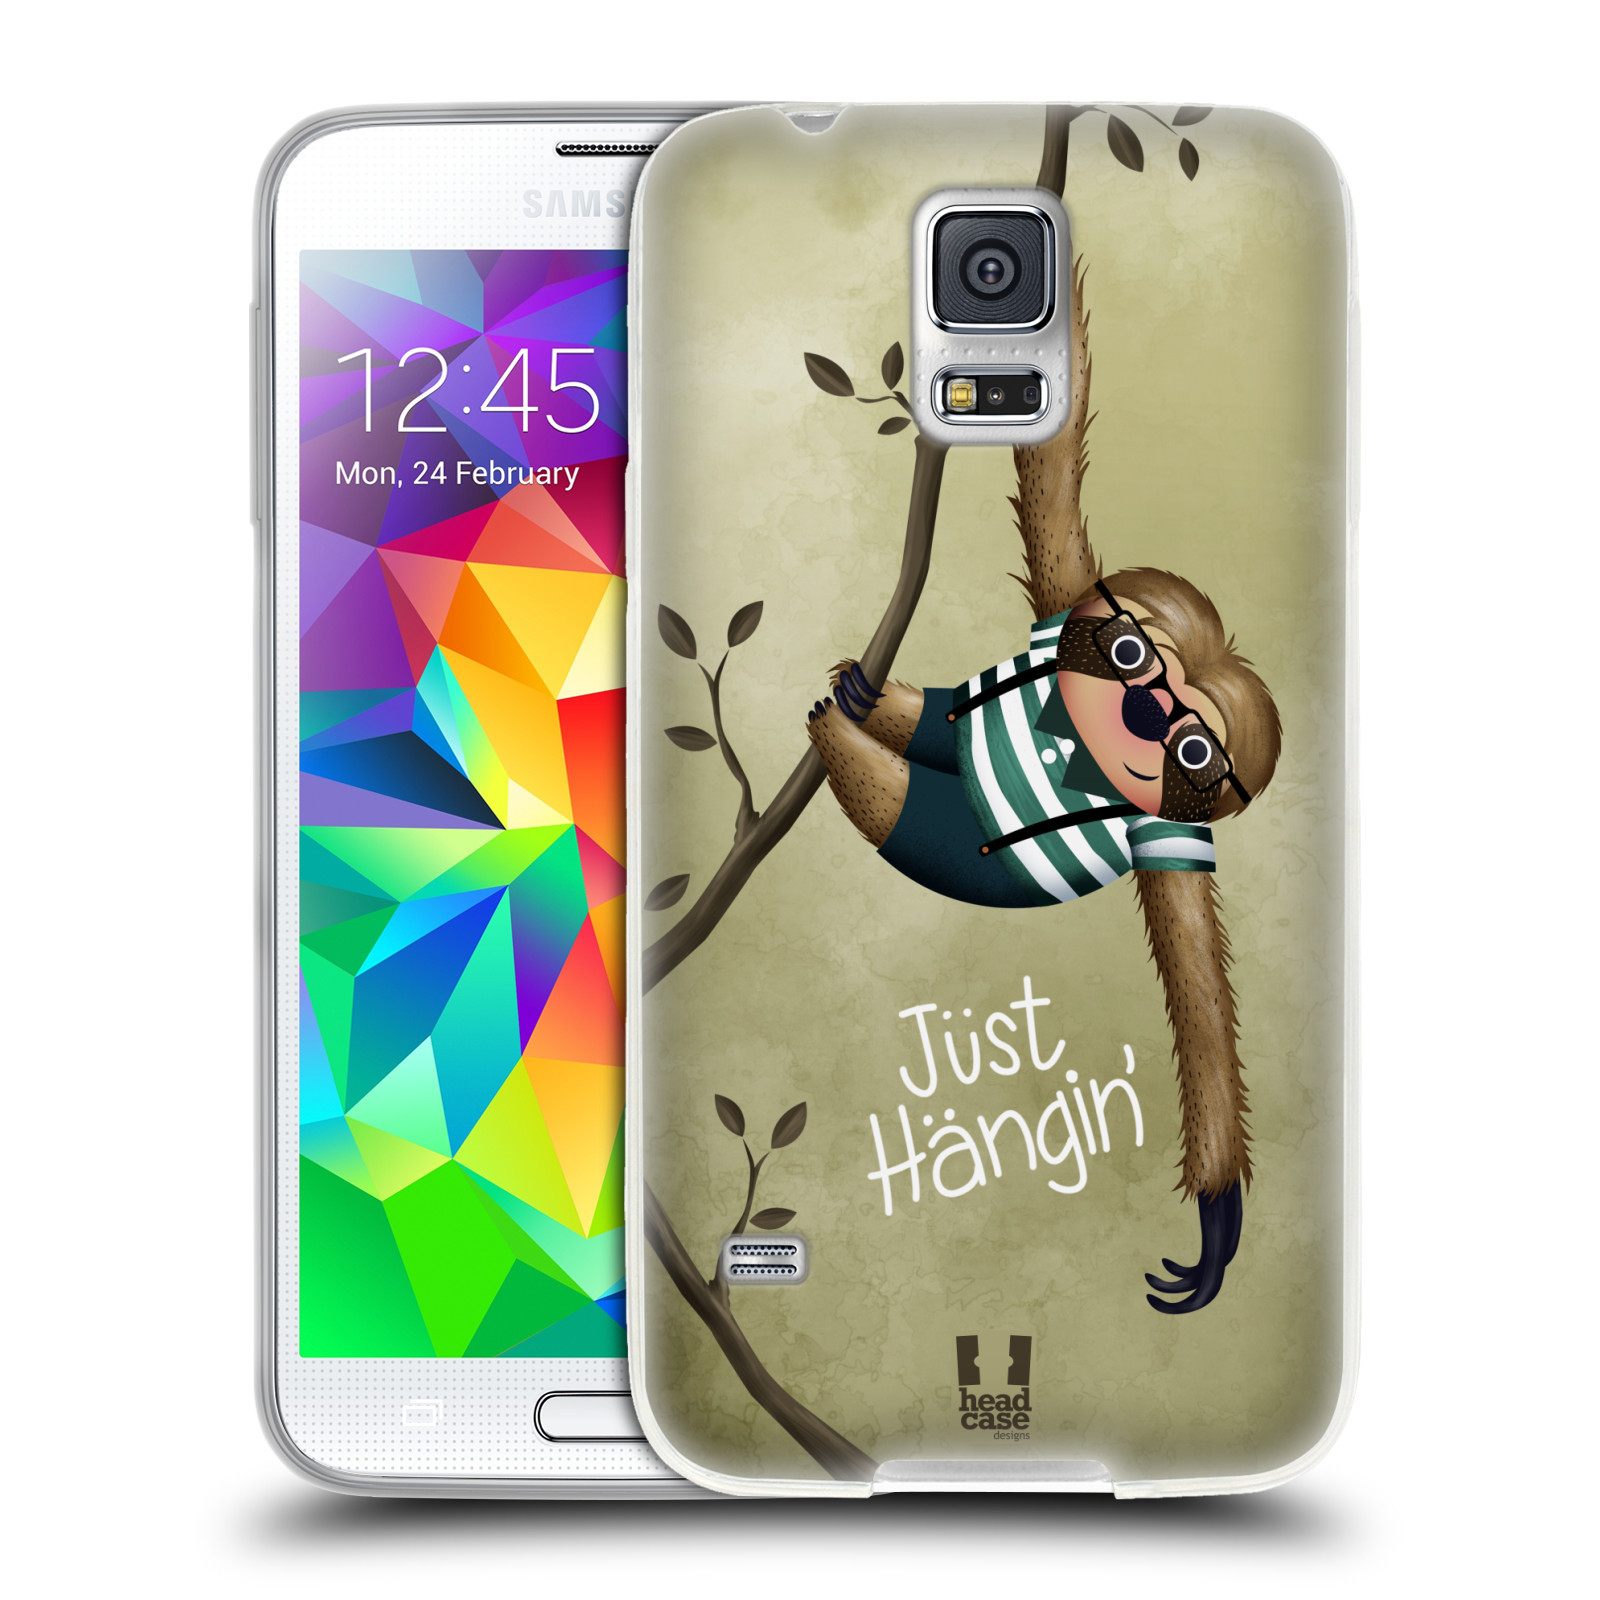 Silikonové pouzdro na mobil Samsung Galaxy S5 HEAD CASE Lenochod Just Hangin